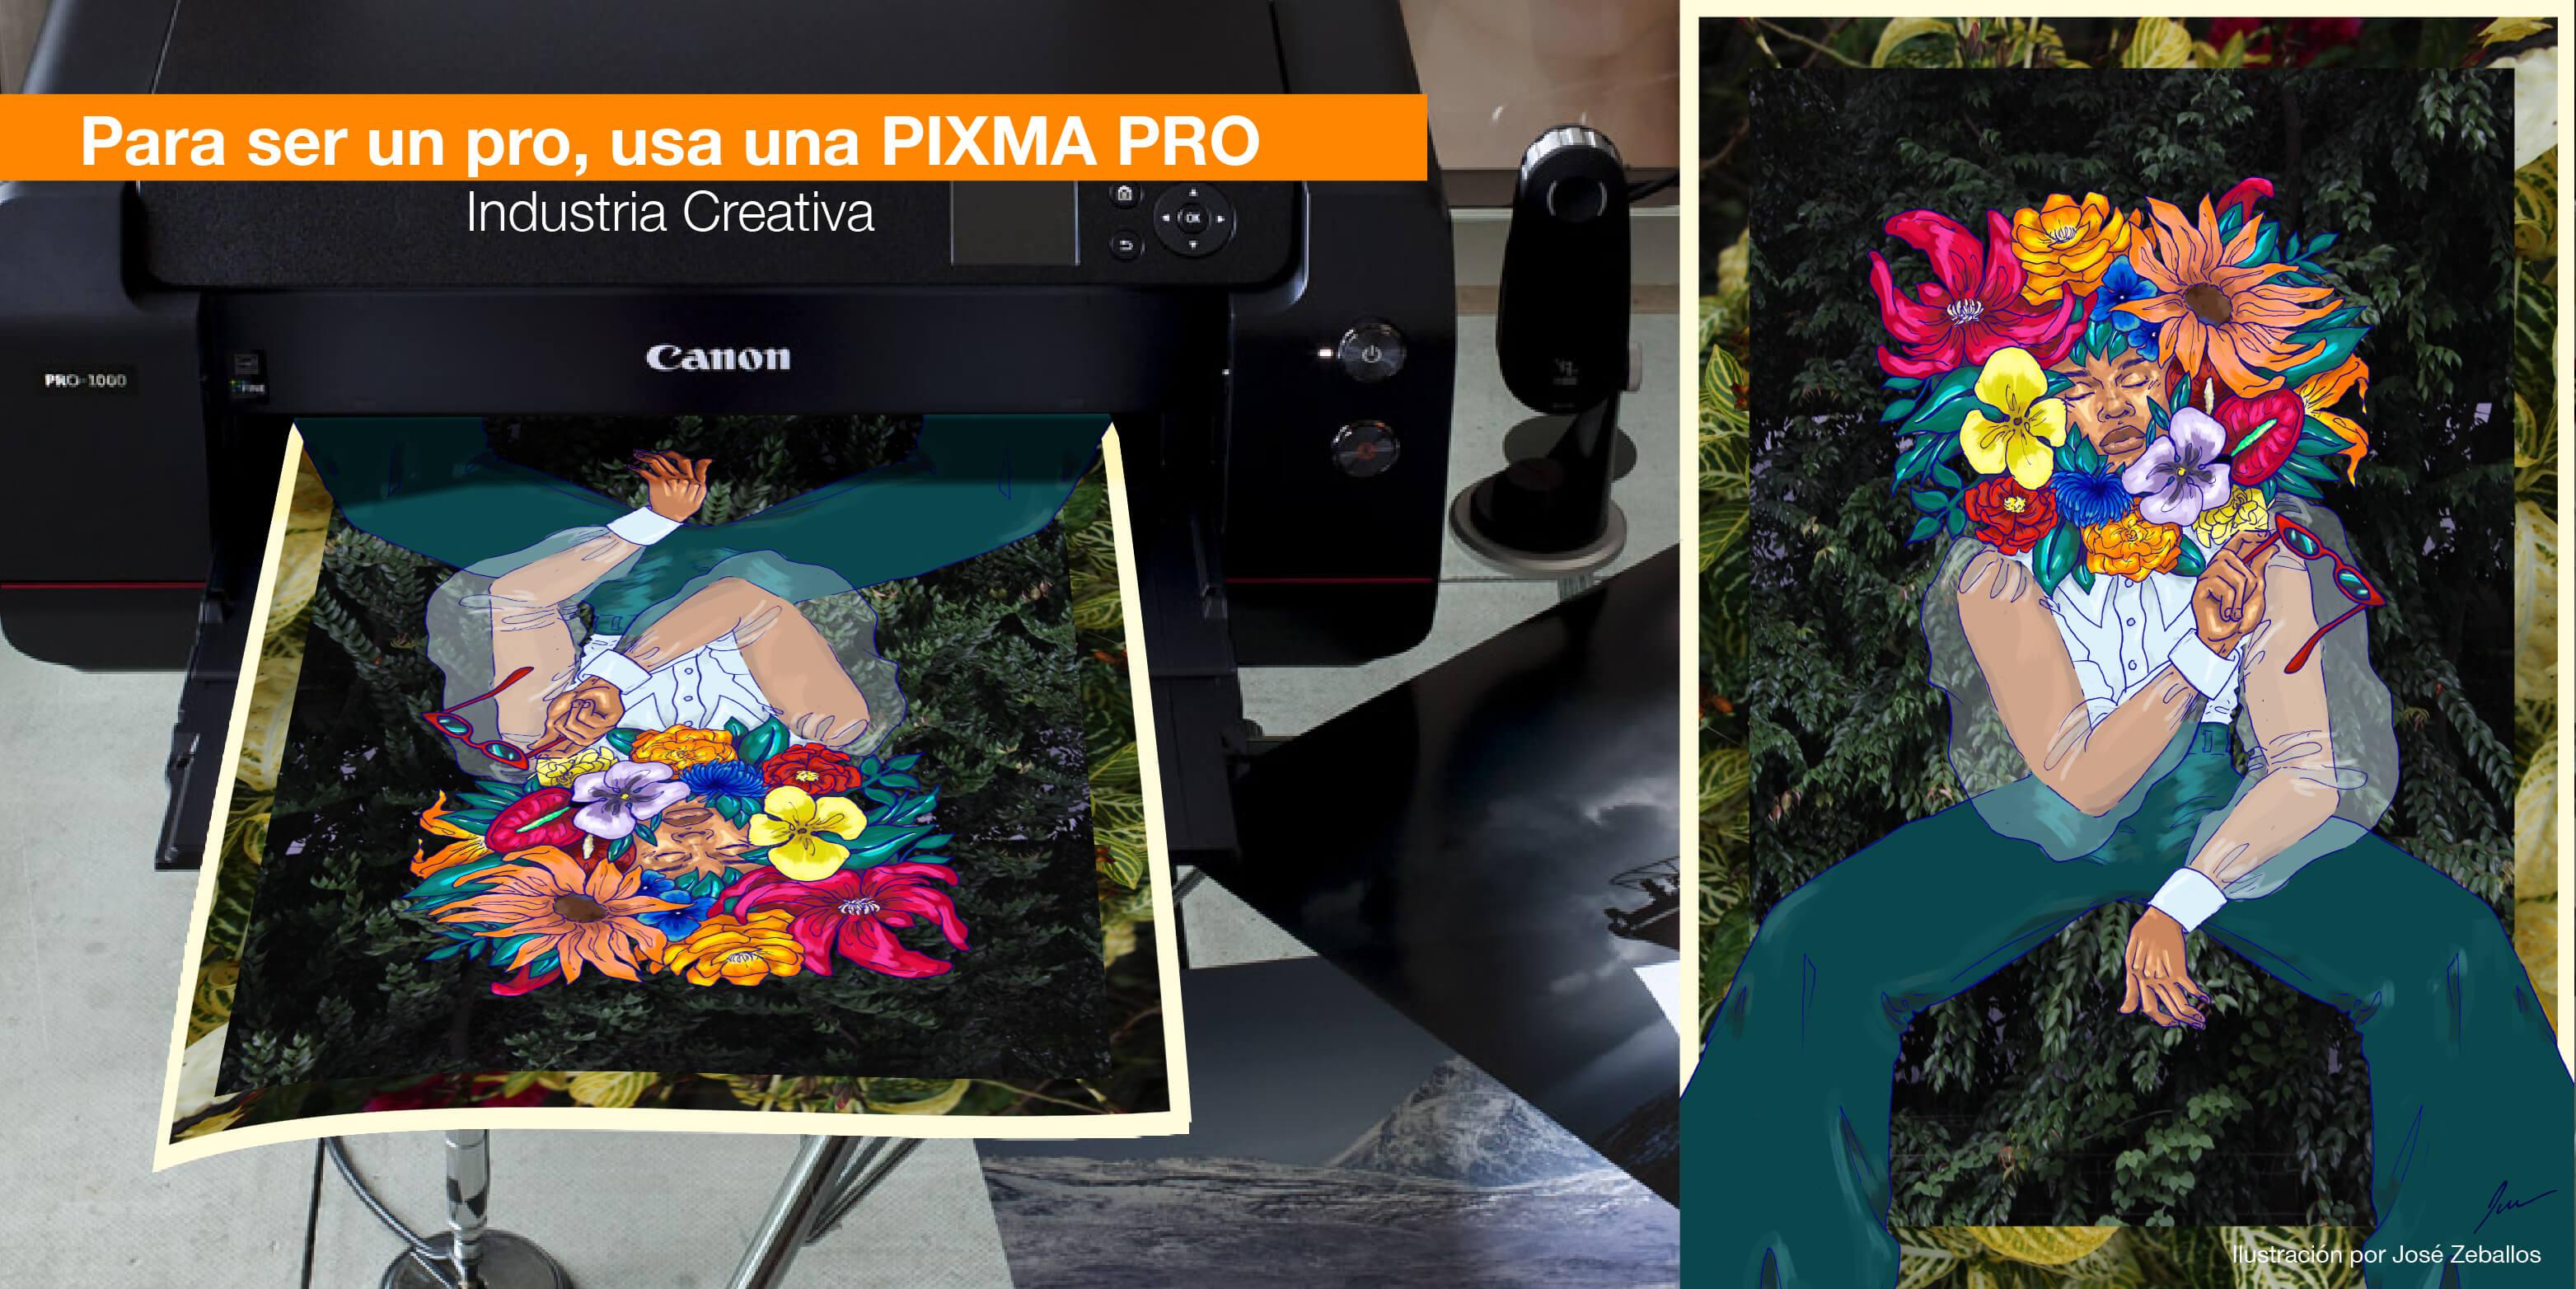 Para ser un pro, usa una PIXMA PRO